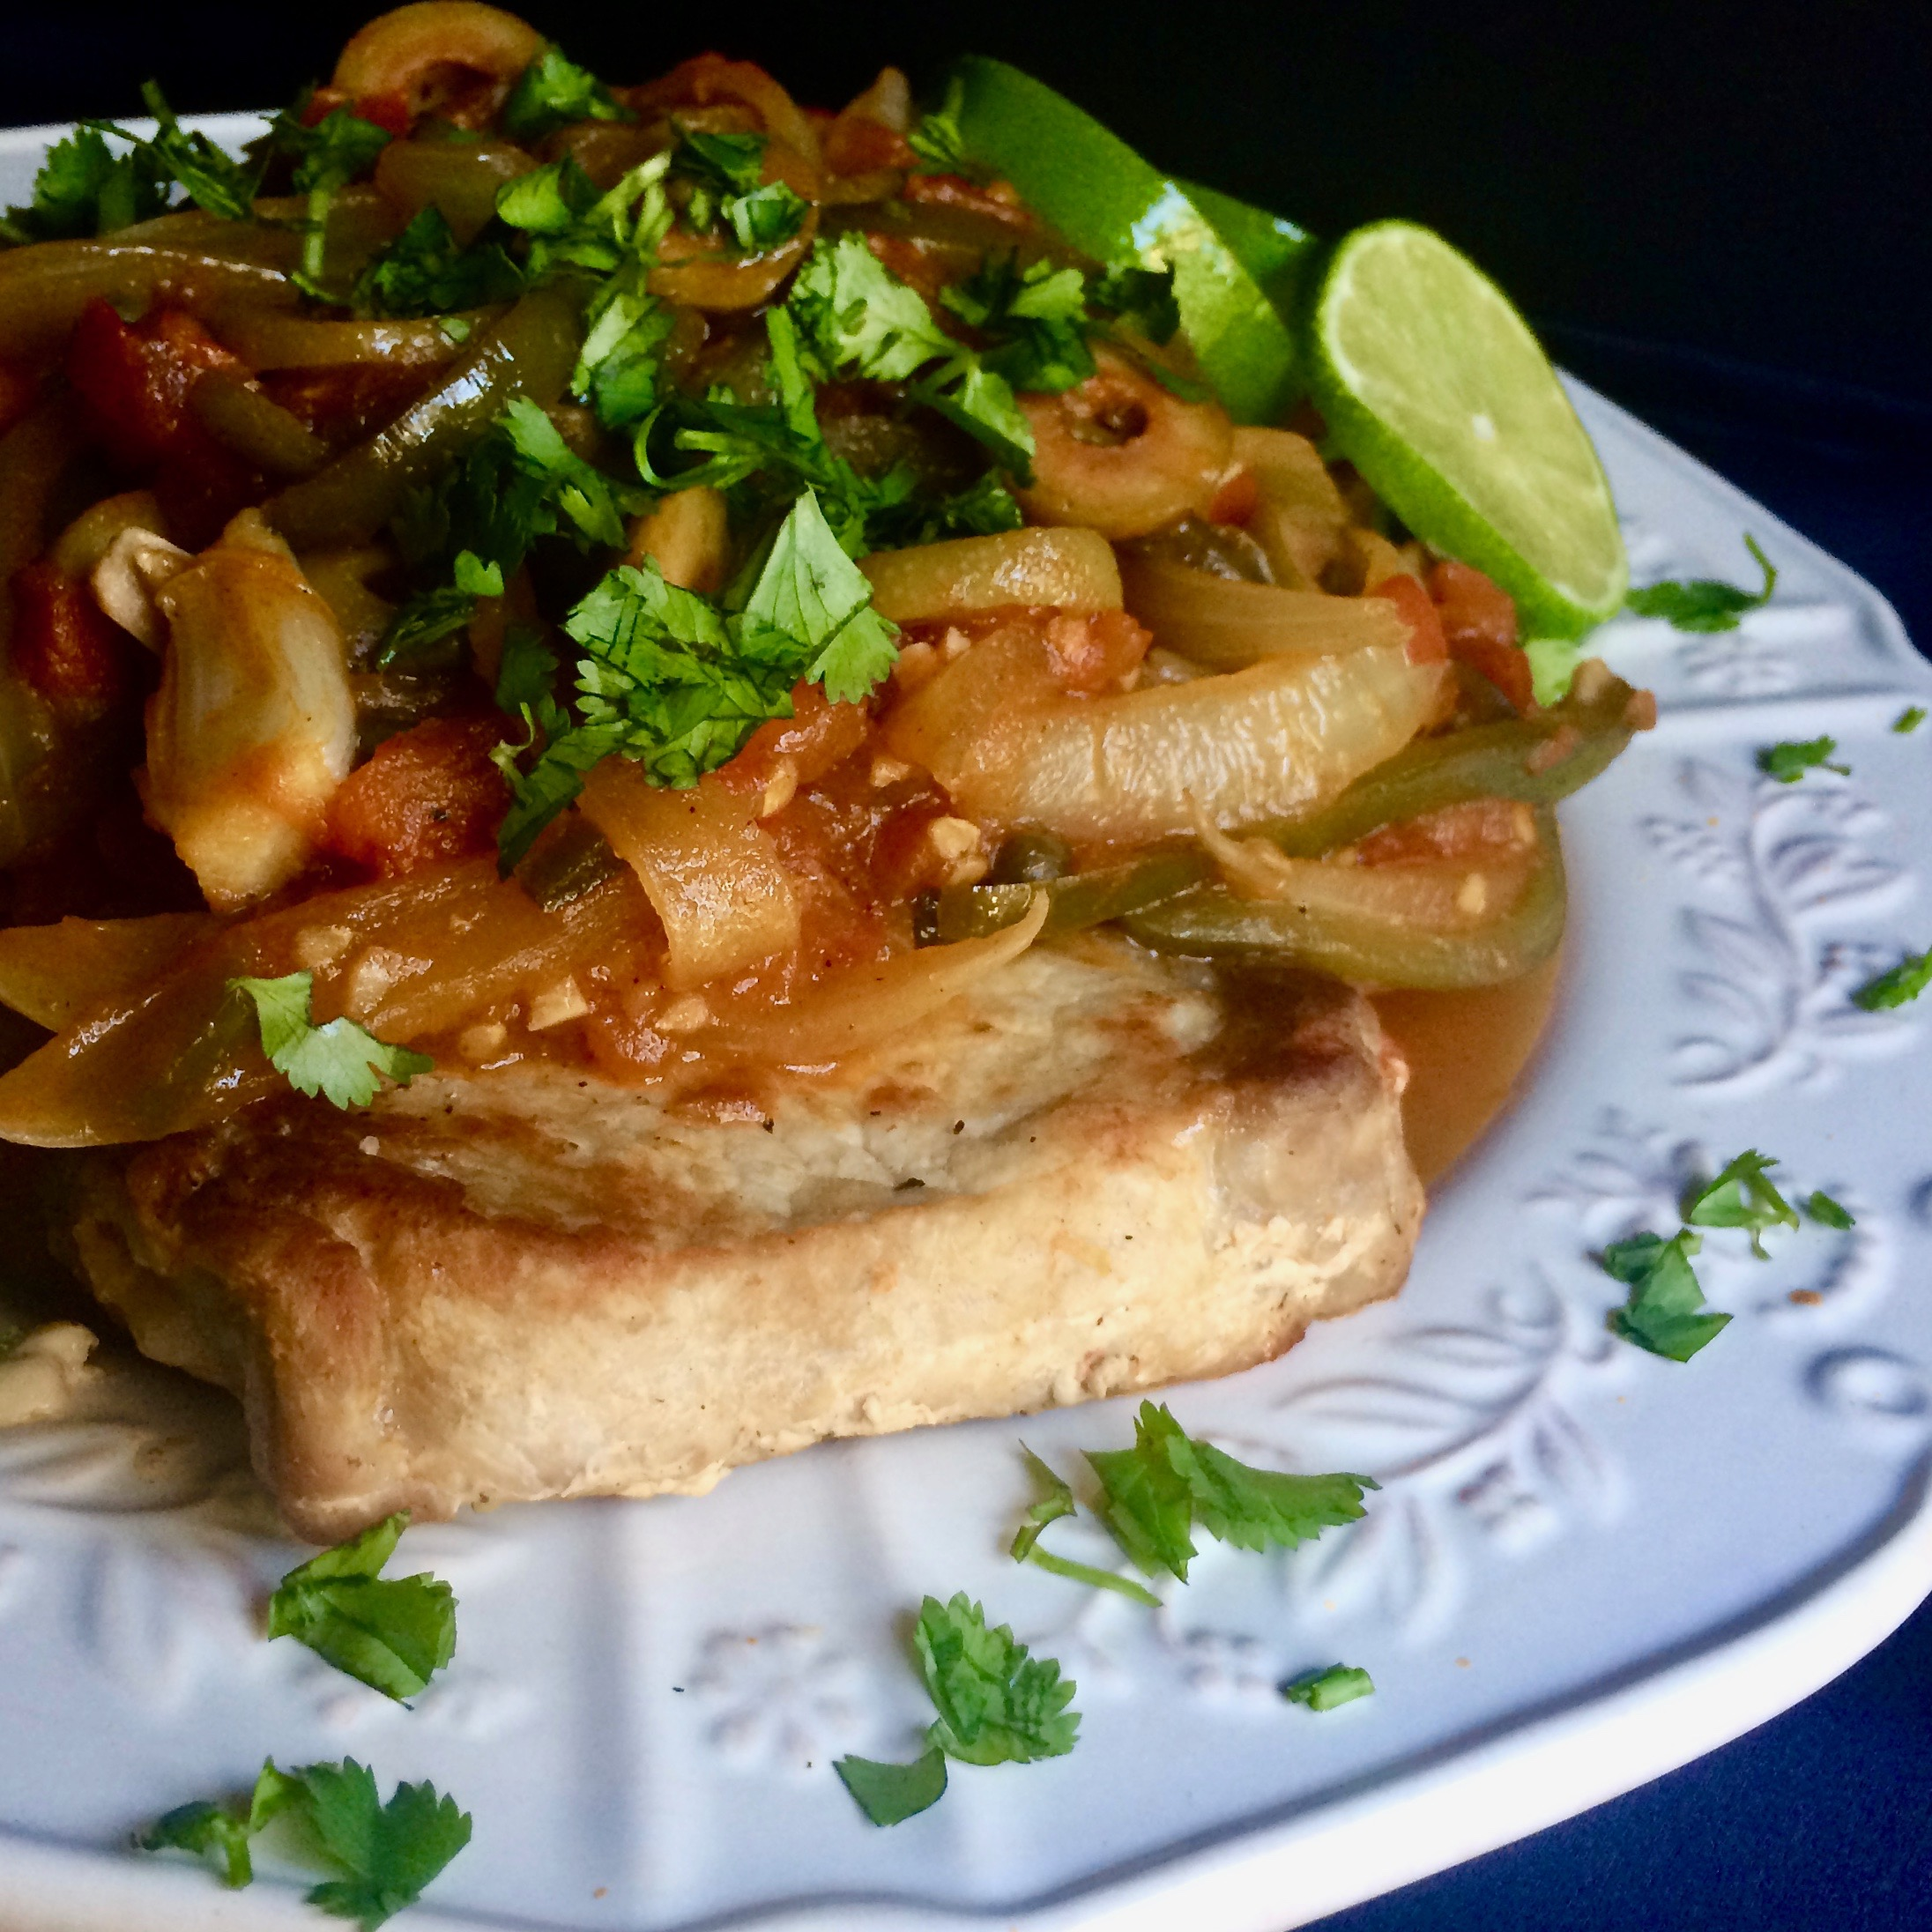 Pork Chops in Veracruz Sauce